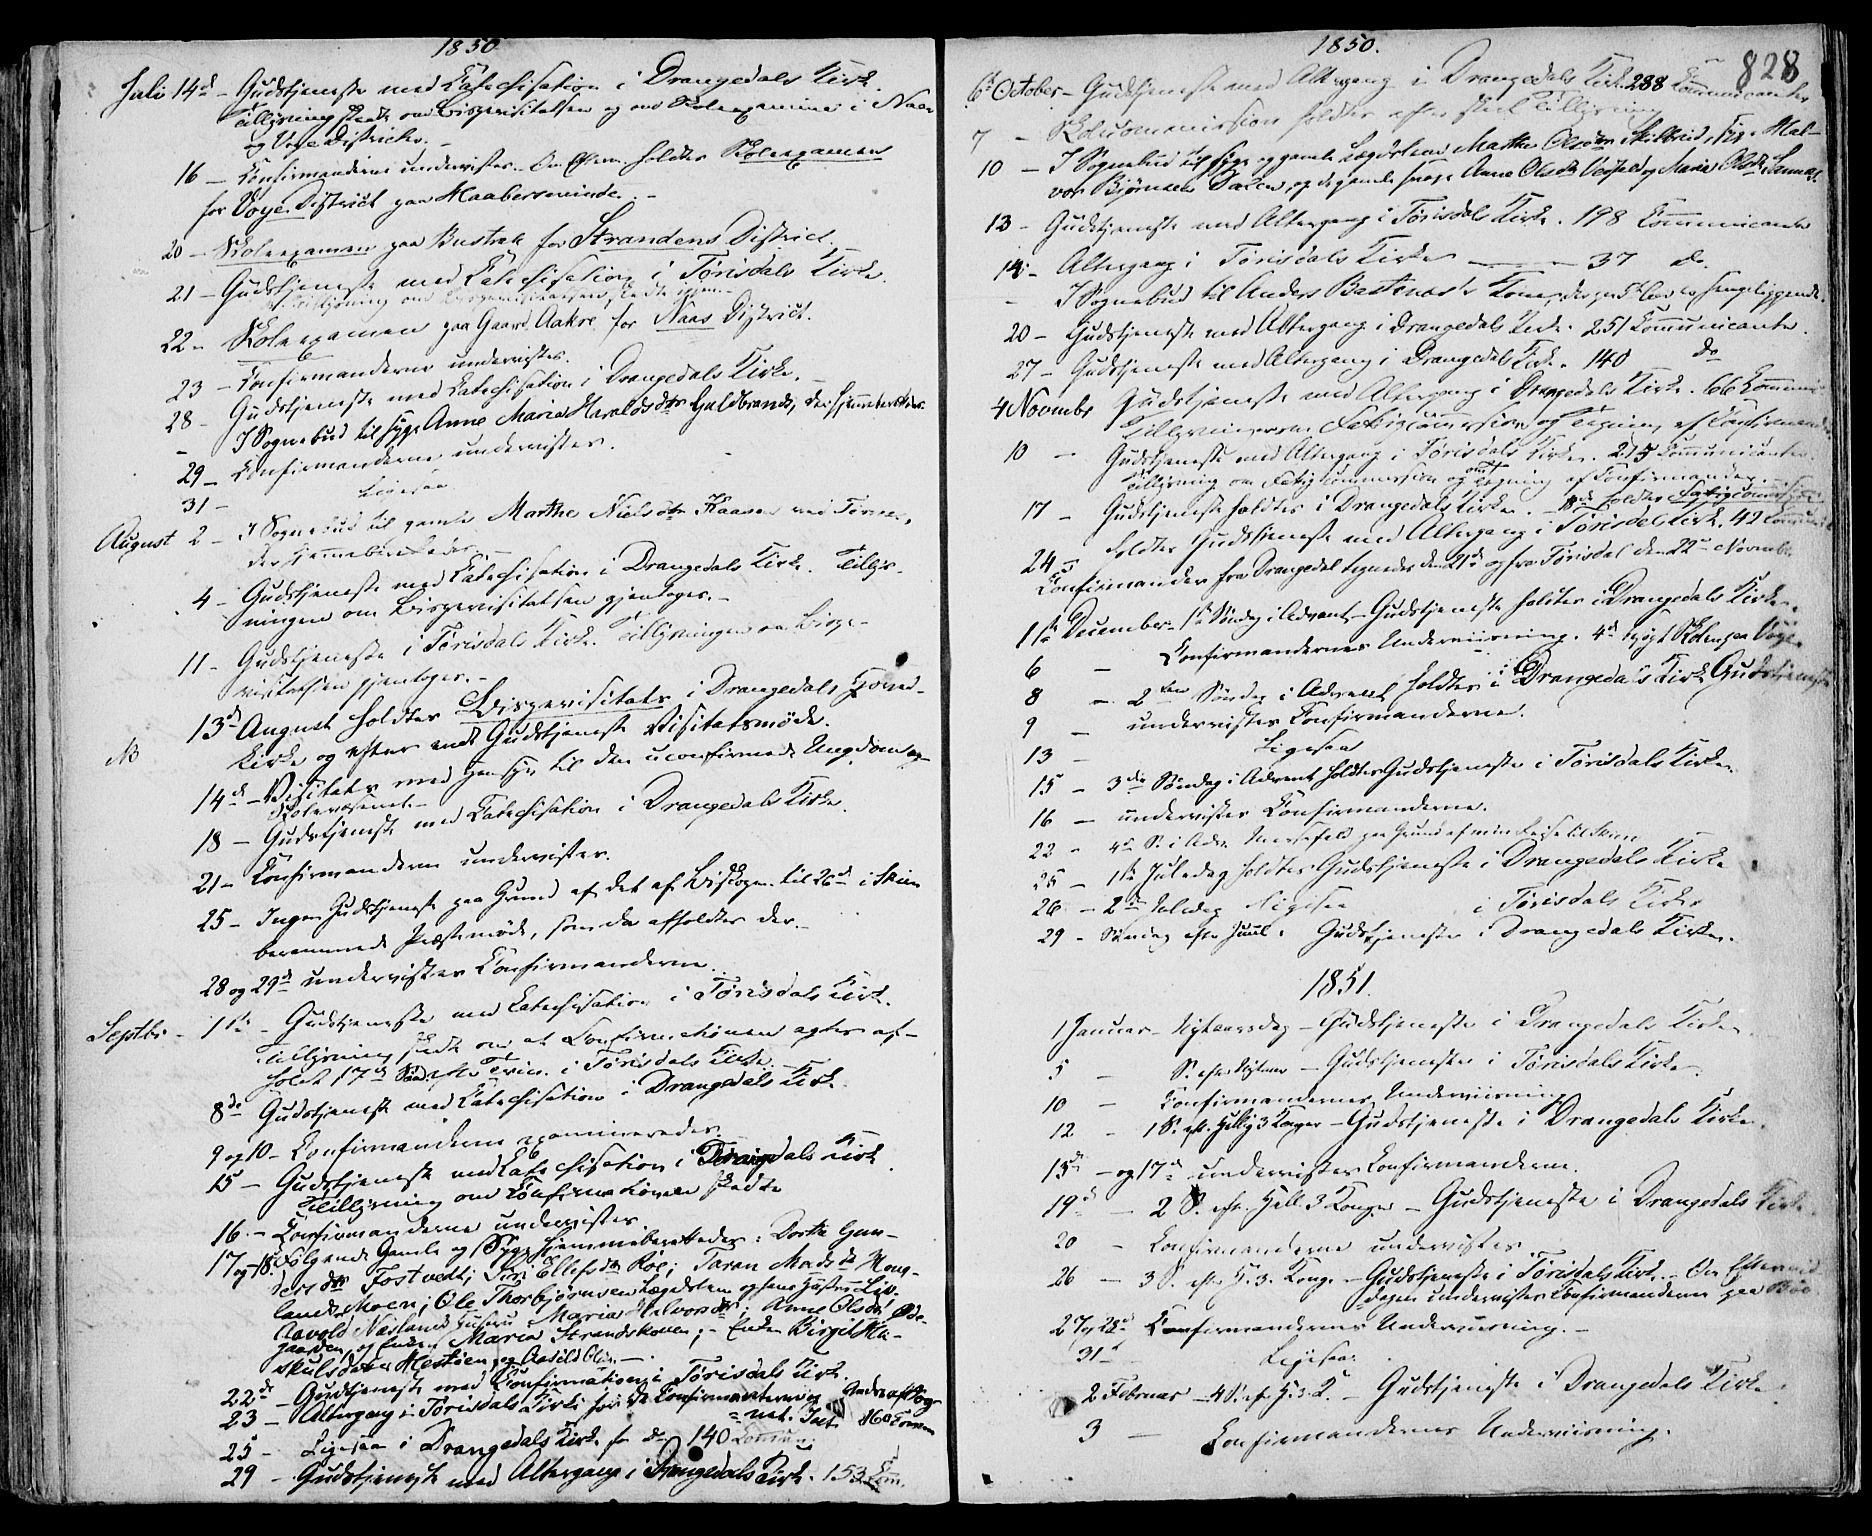 SAKO, Drangedal kirkebøker, F/Fa/L0007b: Ministerialbok nr. 7b, 1837-1856, s. 828